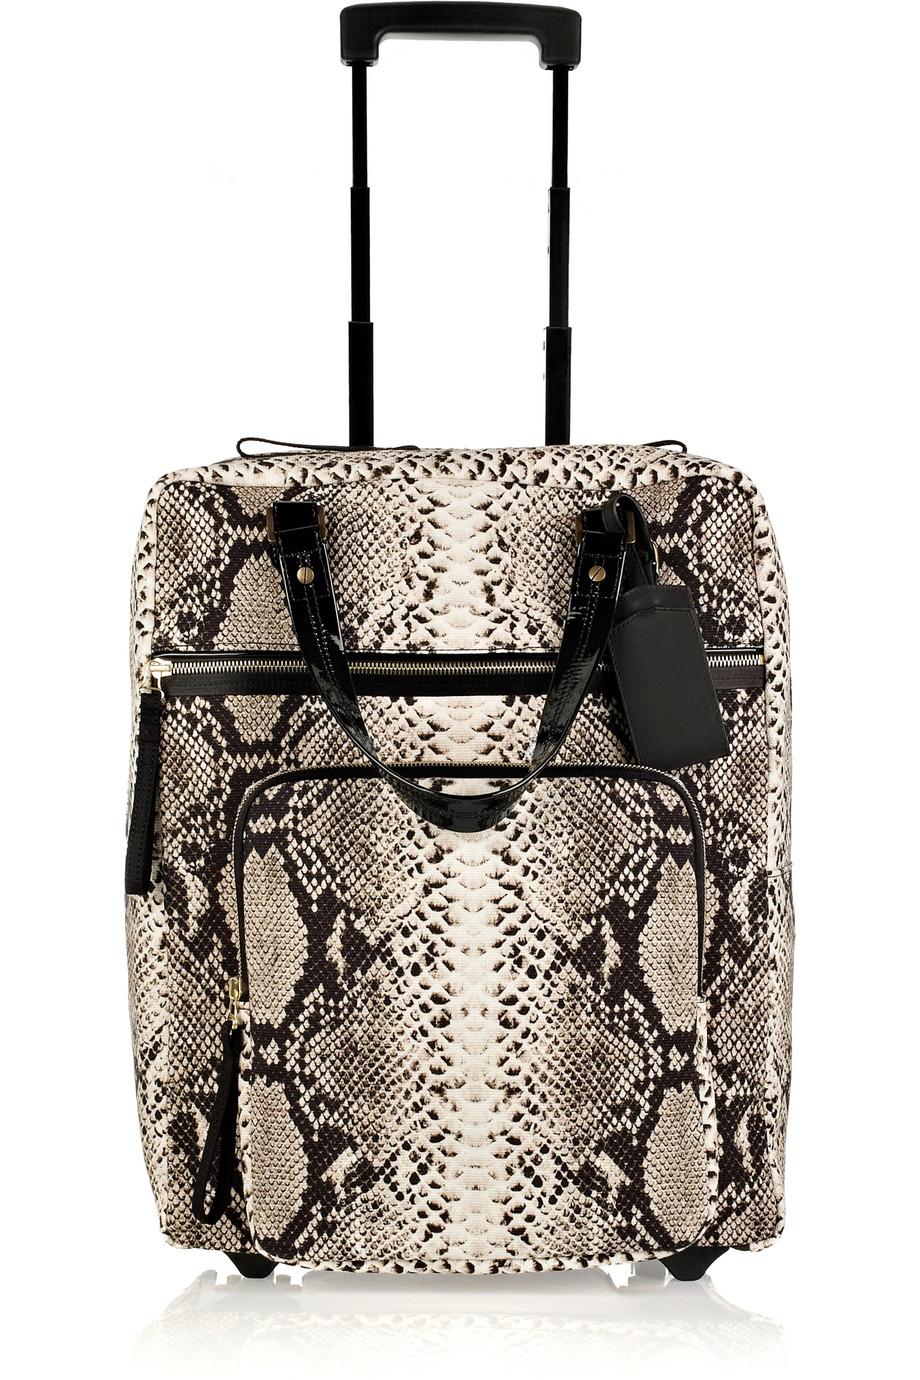 Lanvin Amalia Voyage Cotton-canvas Suitcase in Beige ...